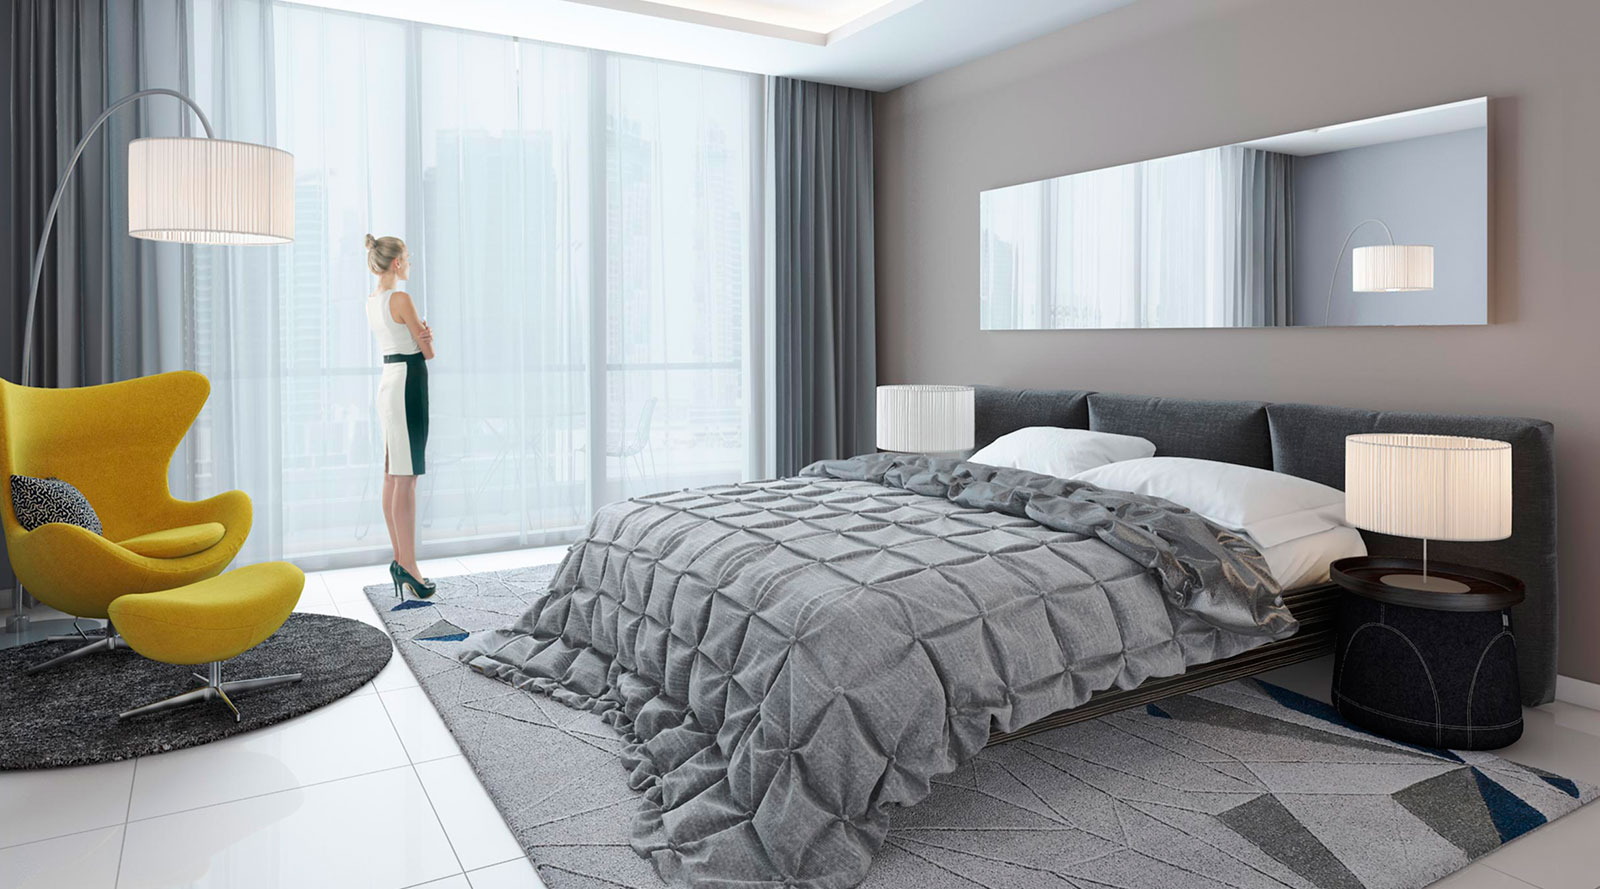 AG_Bedroom